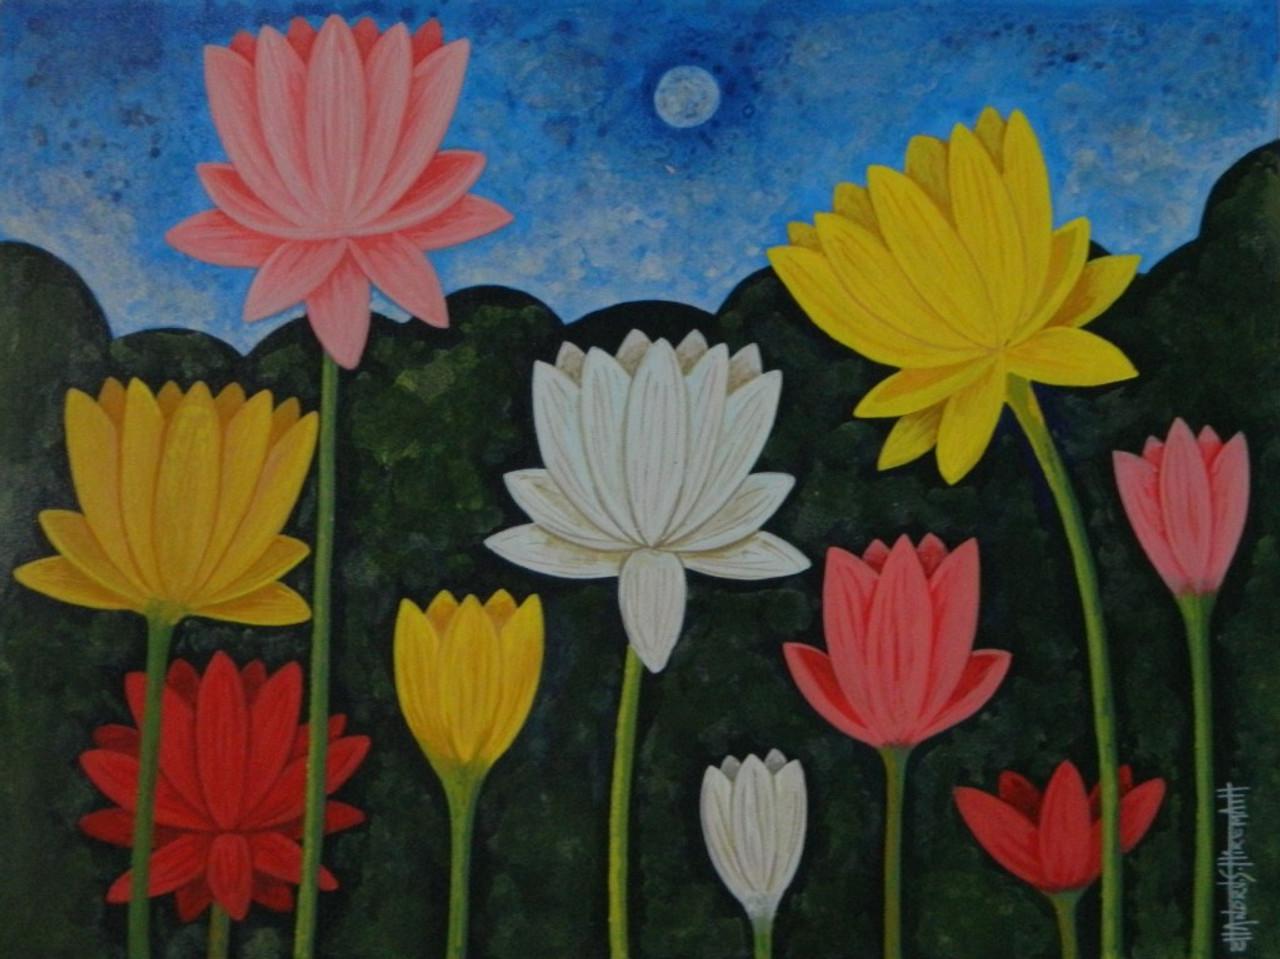 Buy lotus csh0019 handmade painting by chandru s hiremath code lotus flower florallotus csh0019art22314167artist chandru s hiremath mightylinksfo